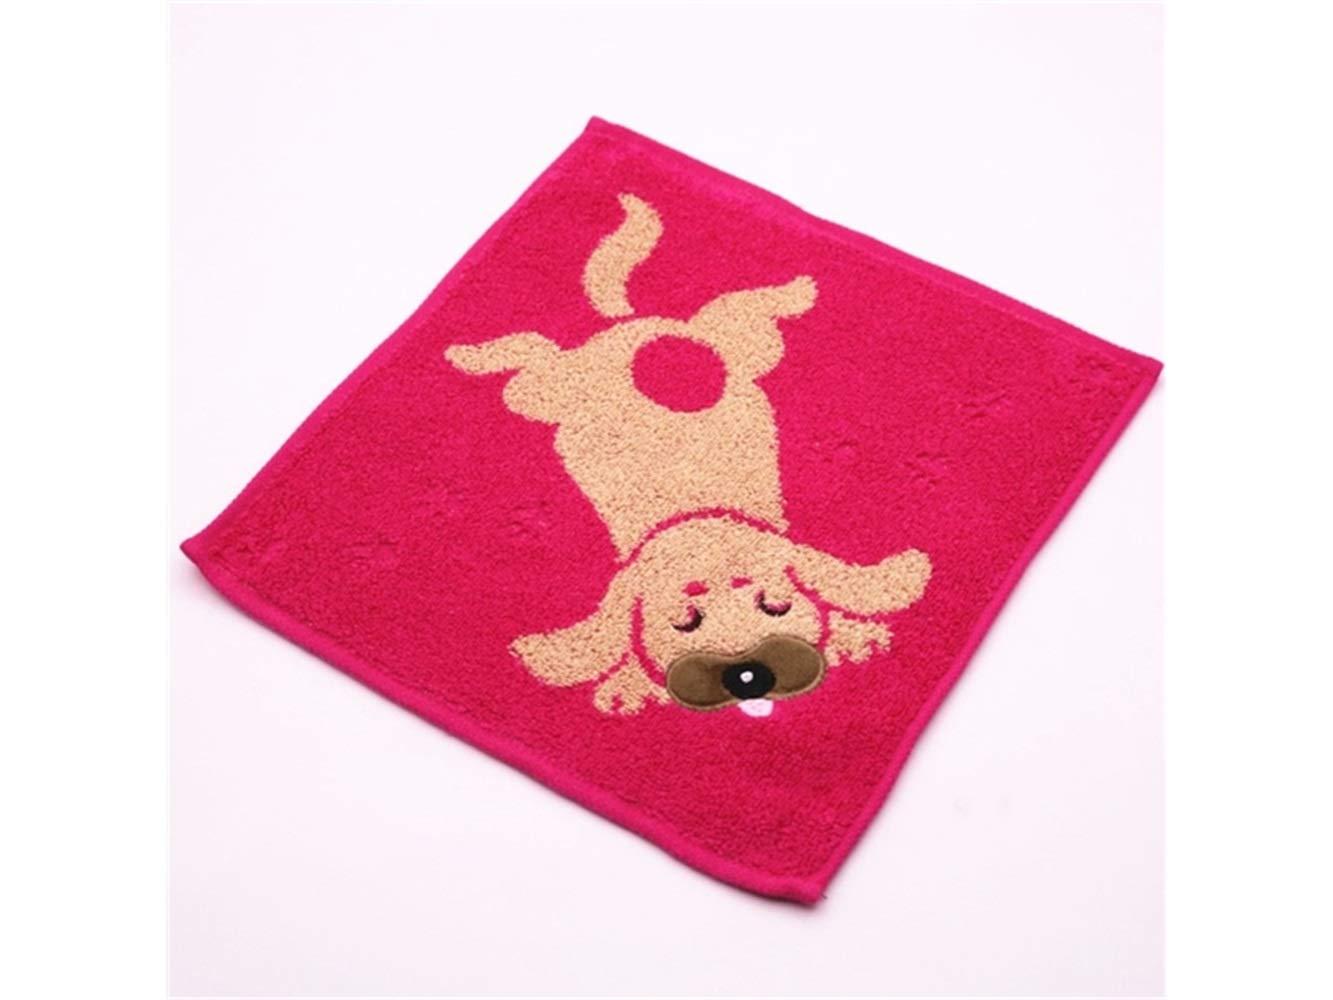 PanpA Suave Perro de dibujos animados de algodón absorbente Toalla de bebé toalla de lavado Toalla de cara espesa toalla de niños cuadrados (azul): ...